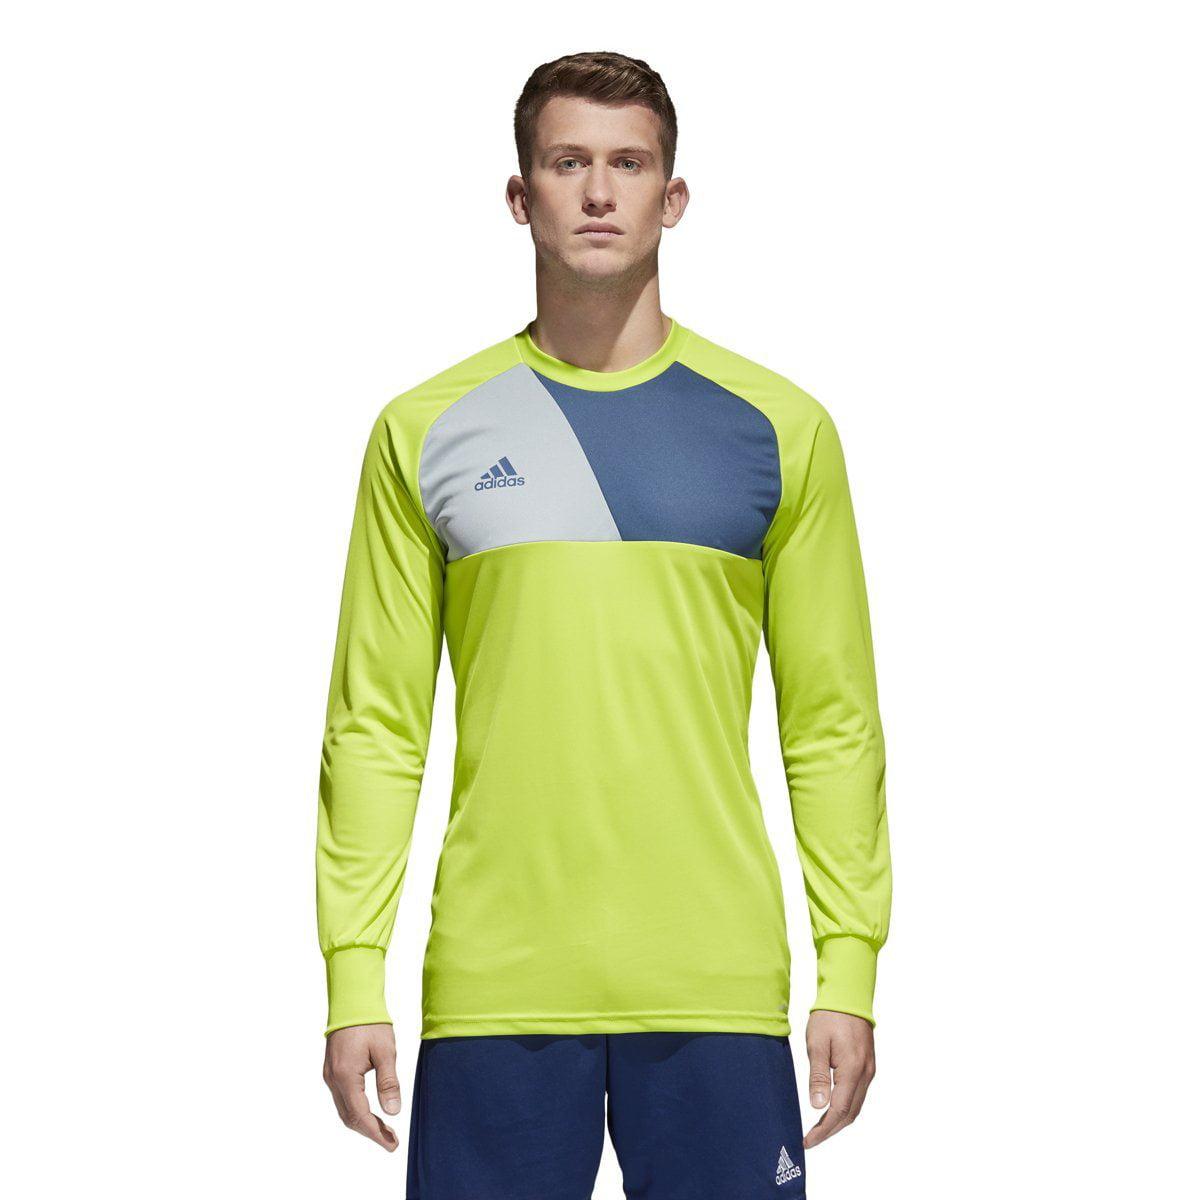 adidas men's soccer assita 17 goalkeeper jersey, solar slime/night marine/light grey, large